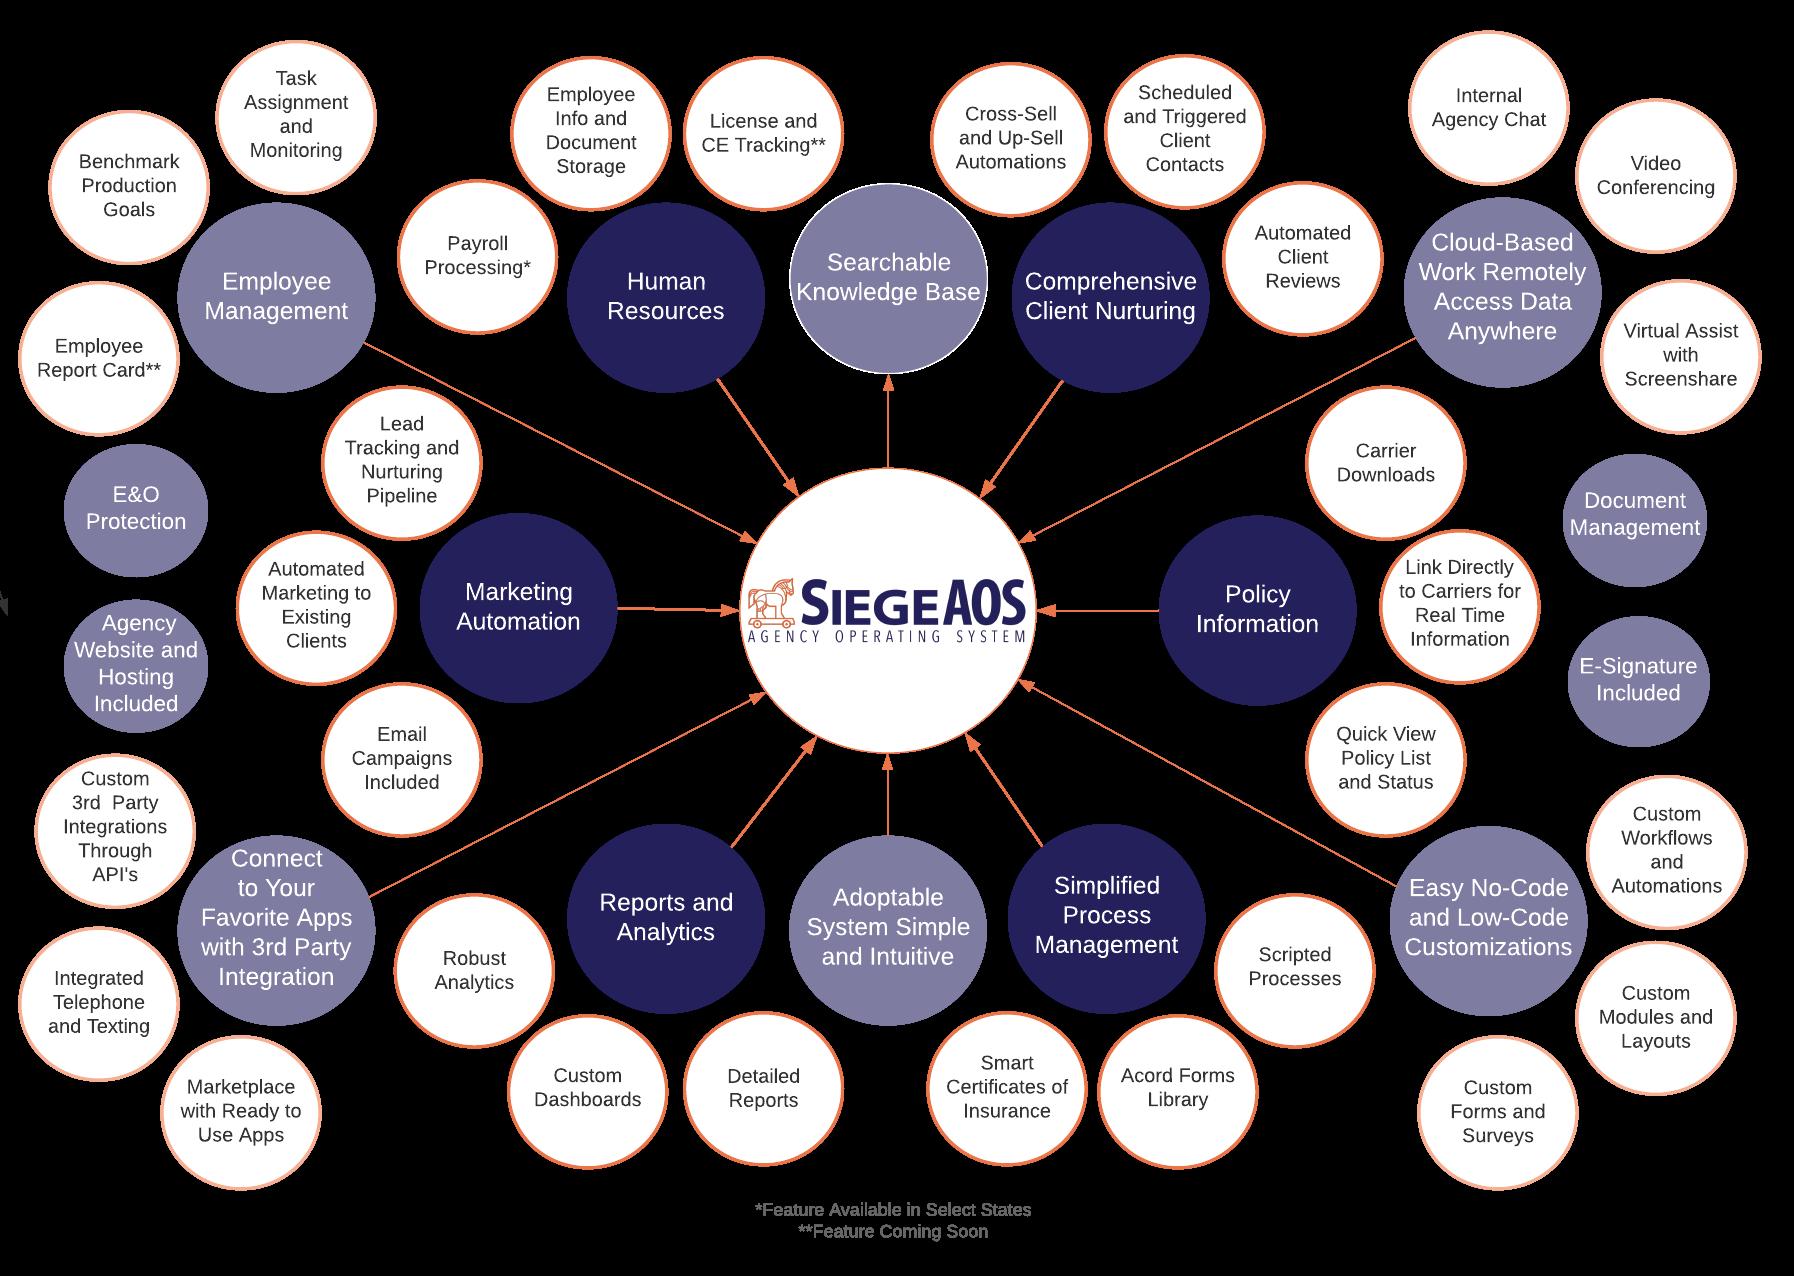 SiegeAOS Features Chart